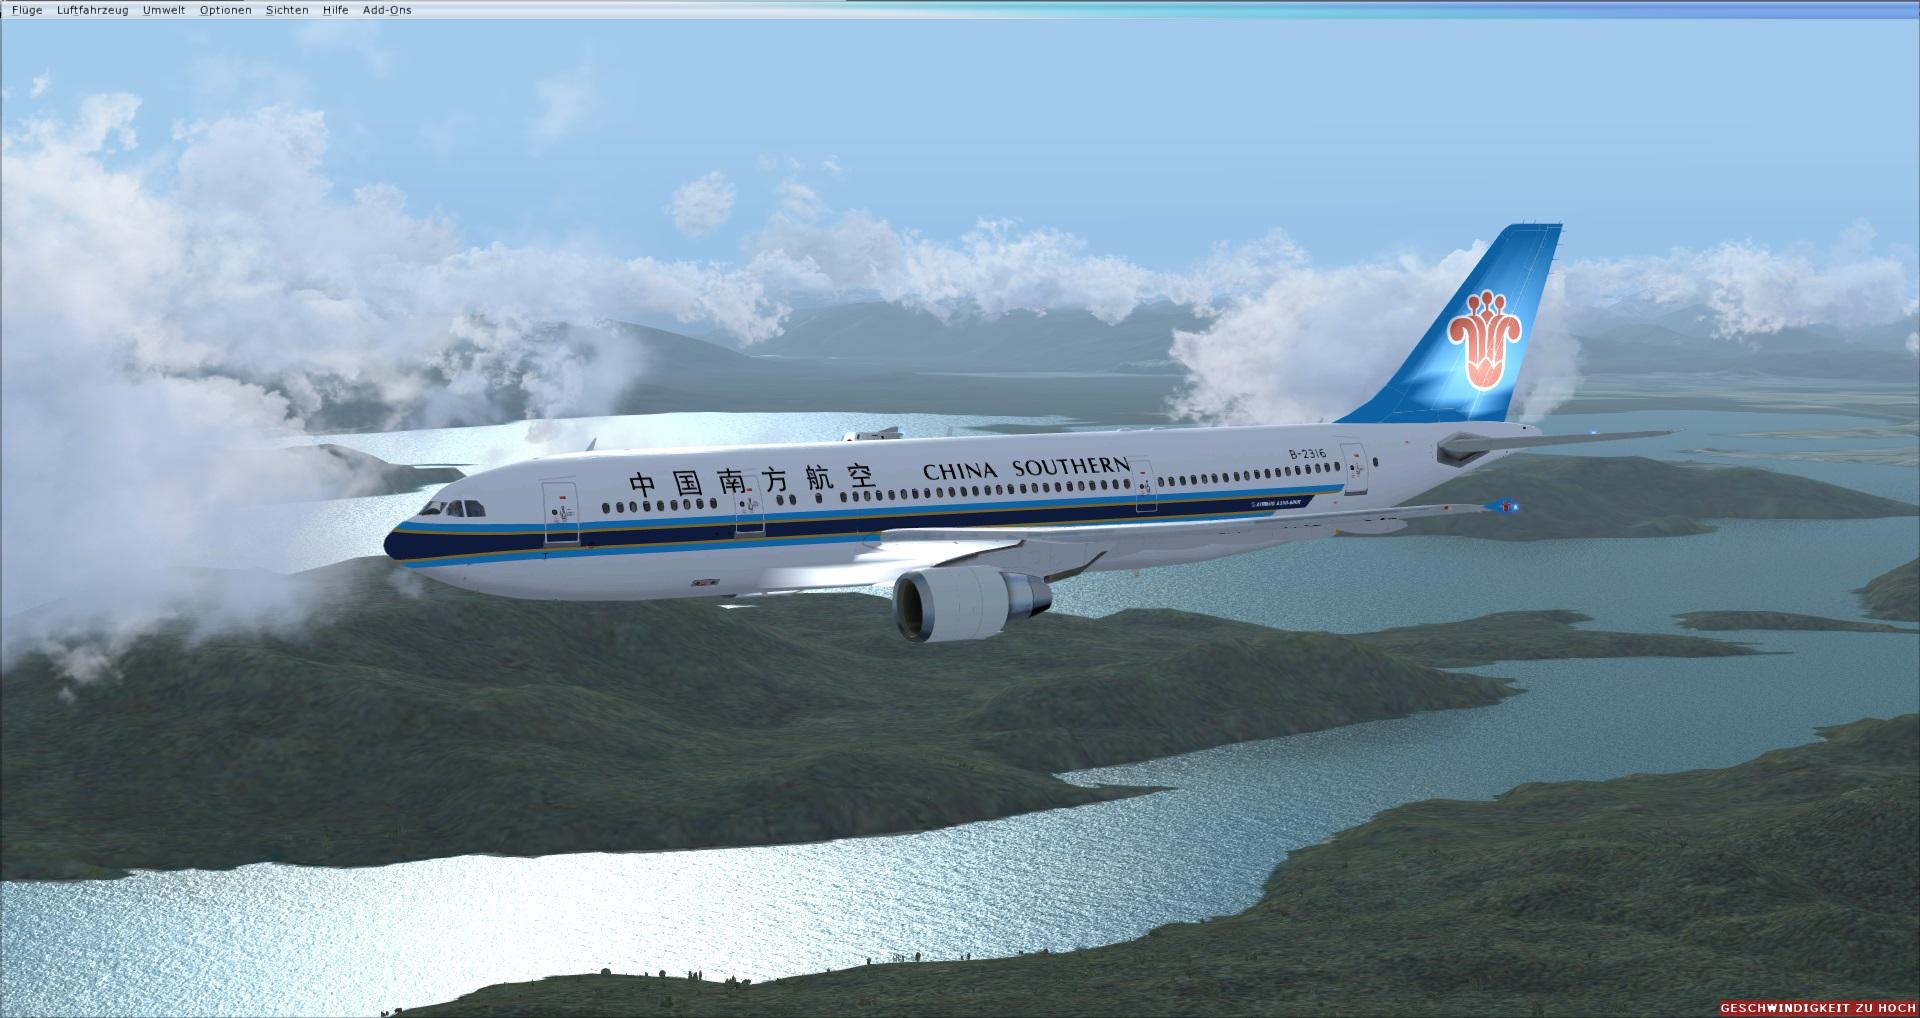 Fs Freeware Net Fsx Airbus A300 600r China Southern